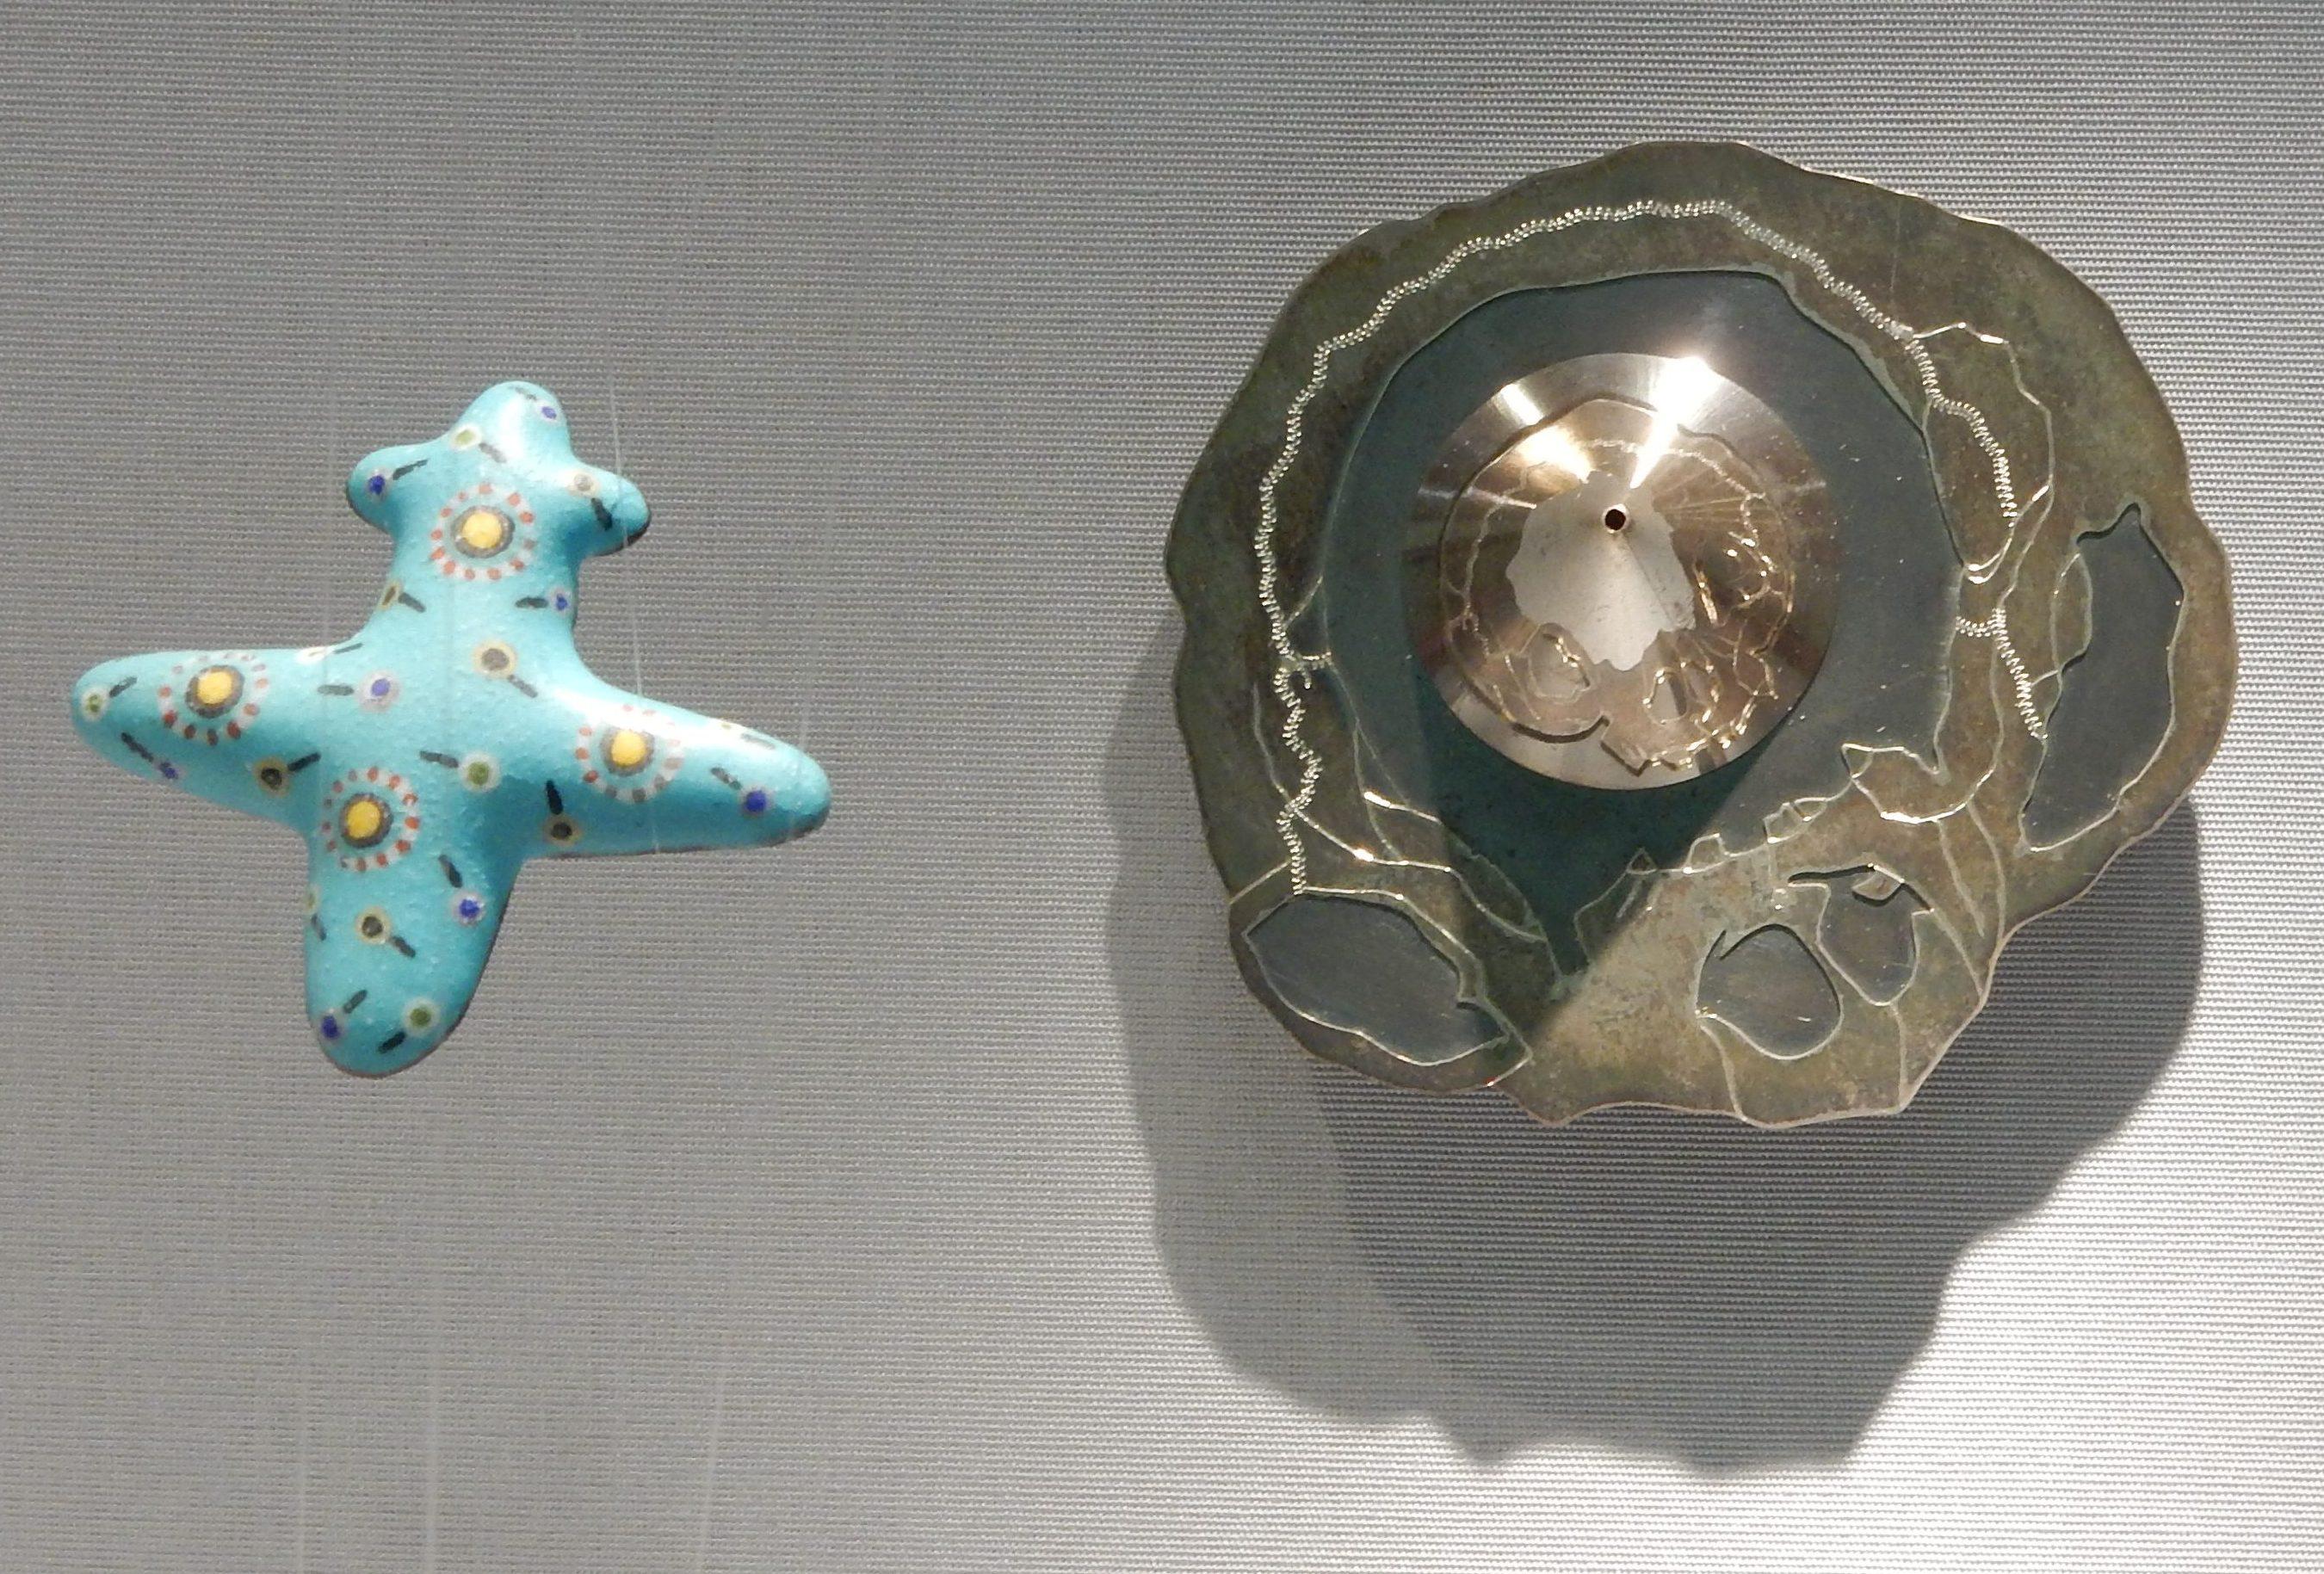 Wolfgang Lieglein, Flugzeug, broche, 1994, Johanna Dahm, Anamorphotische Brosche Schädel, broche, 1990. Schmuckmuseum Pforzheim. Foto Coert Peter Krabbe, metaal